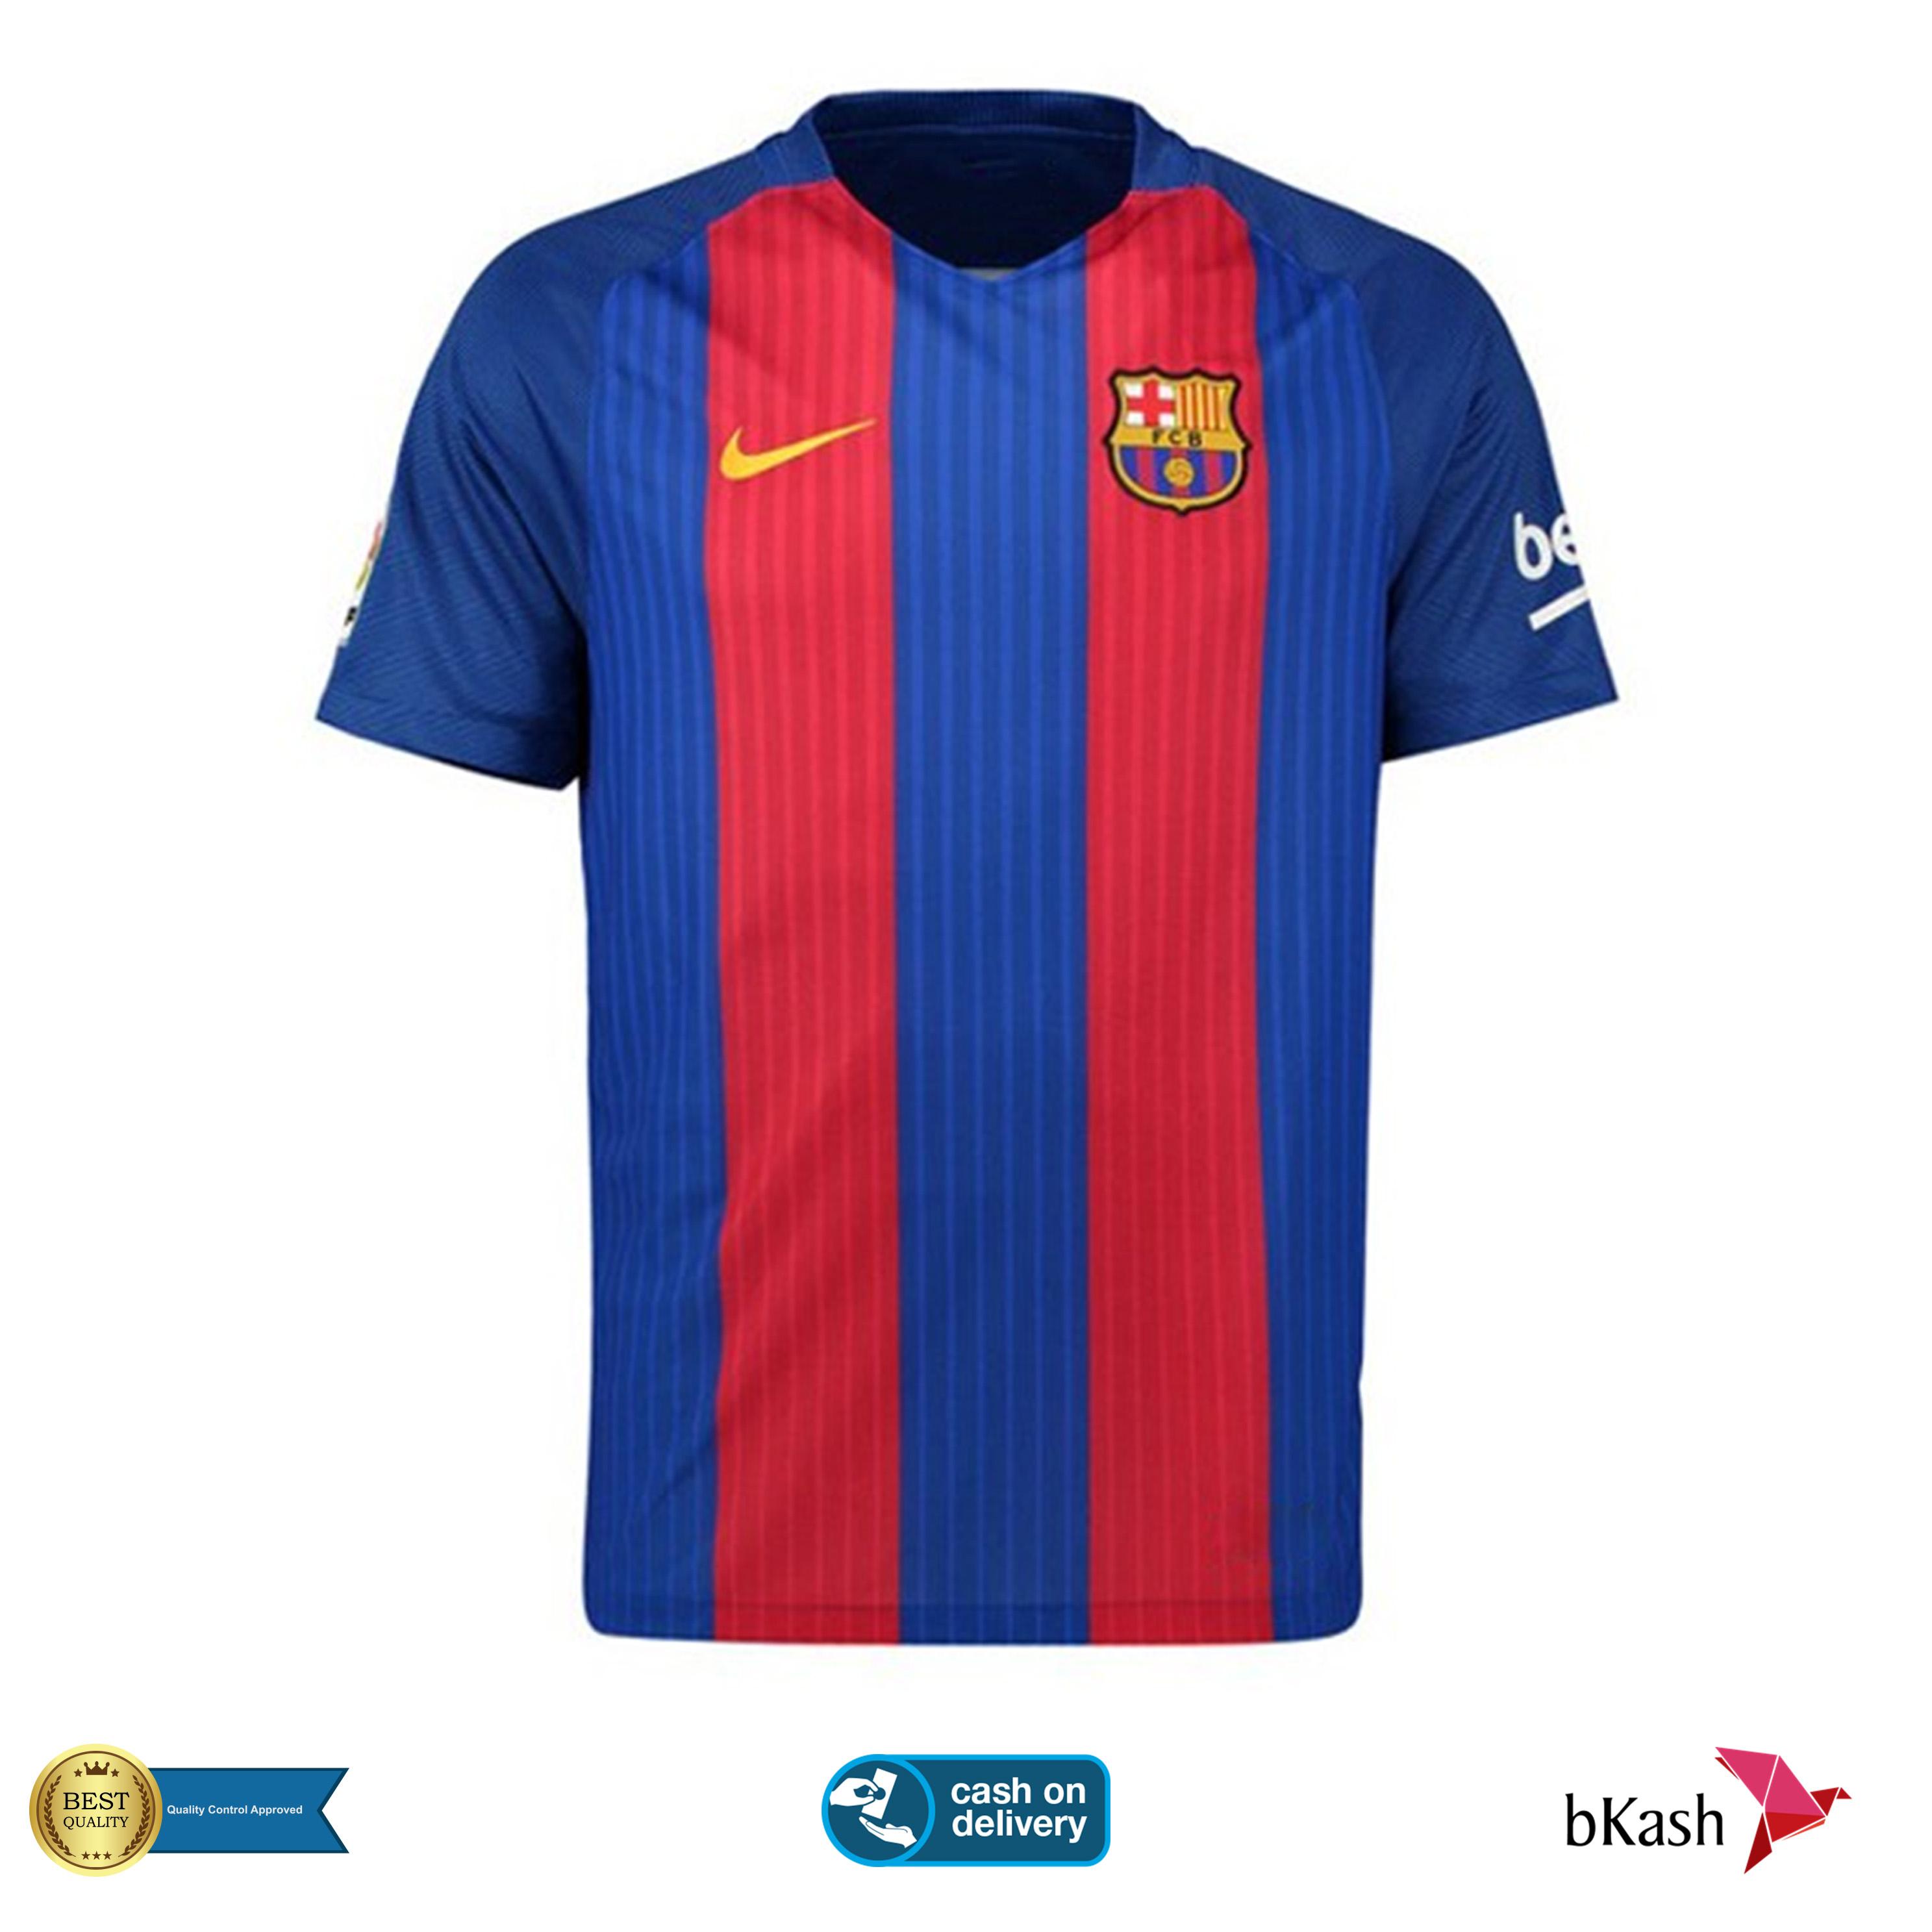 b8ce1ece4c66e Yükle (2975x2975)Nike FC Barcelona Official 2016 2017 Home Soccer Football  Jersey eBayNike FC Barcelona Official 2016 2017 Home Soccer Football Jersey  ...